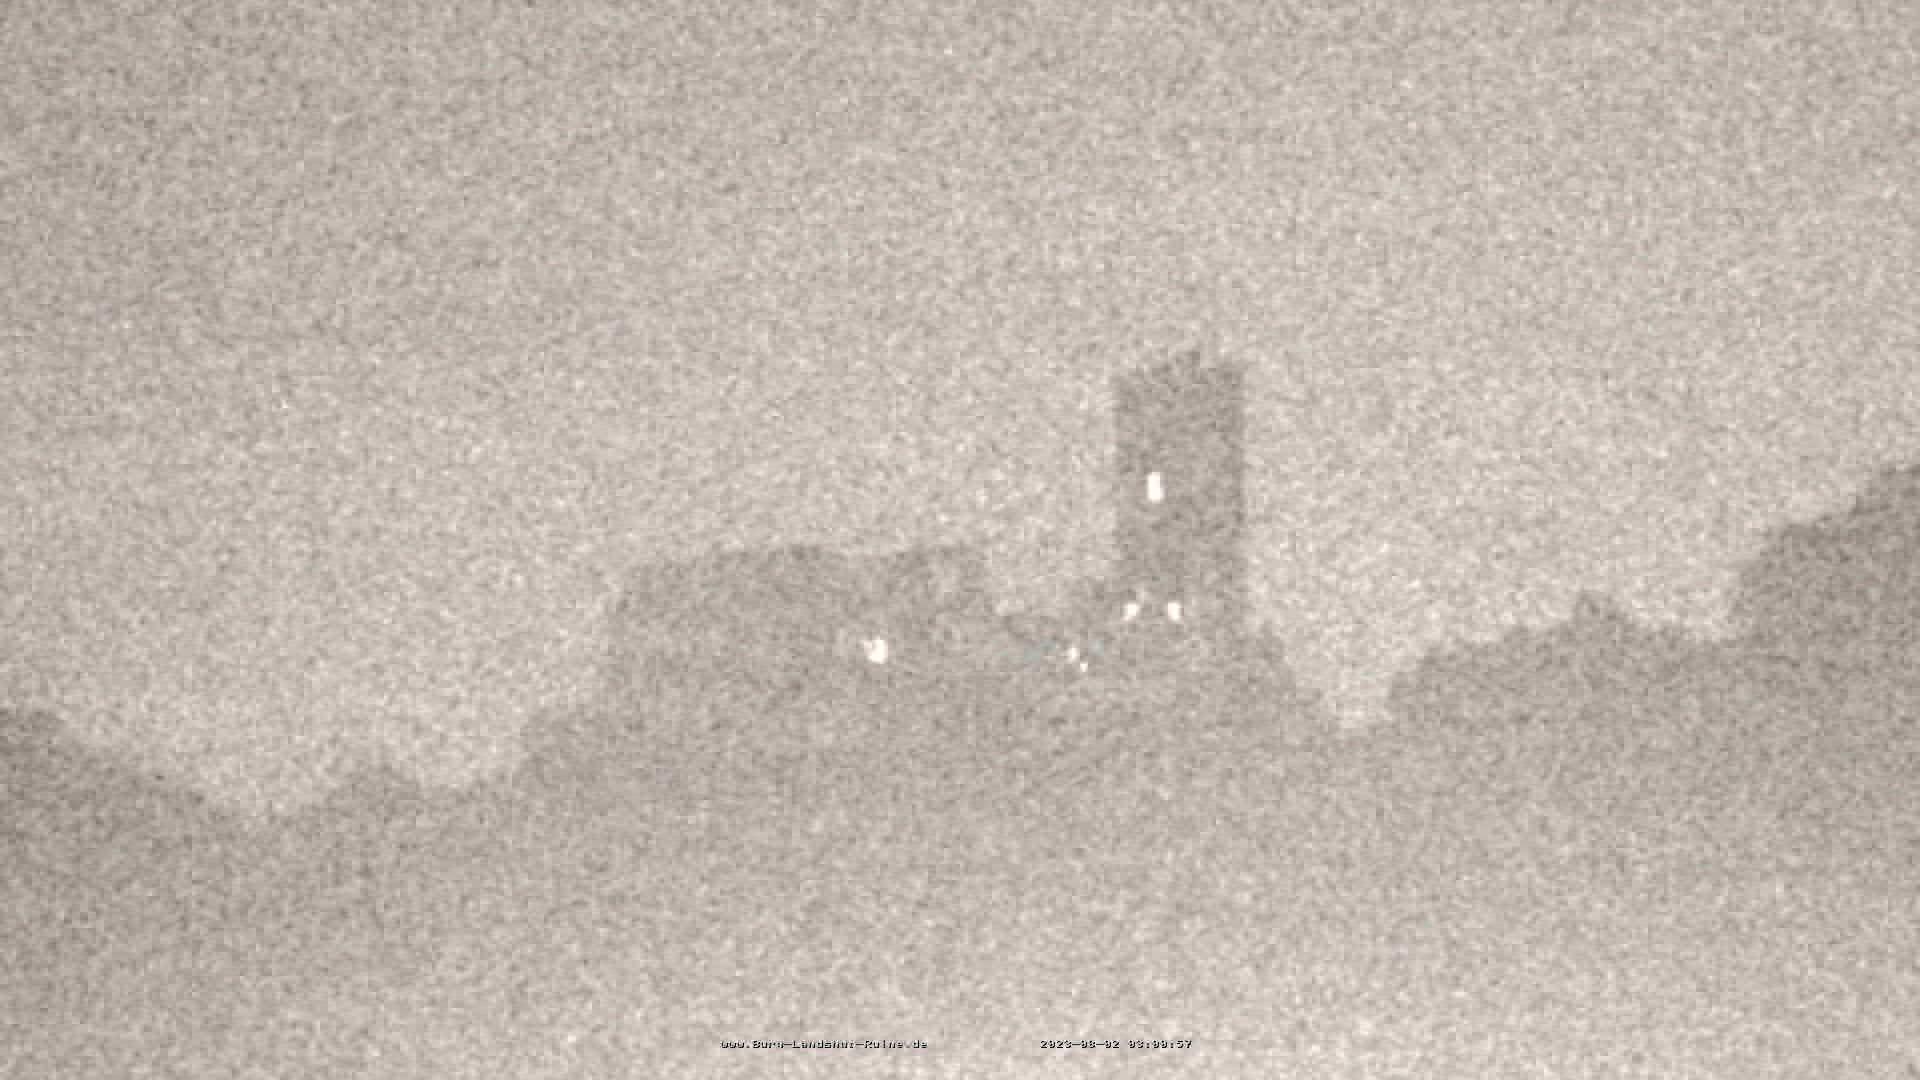 Bernkastel-Kues Tue. 03:00